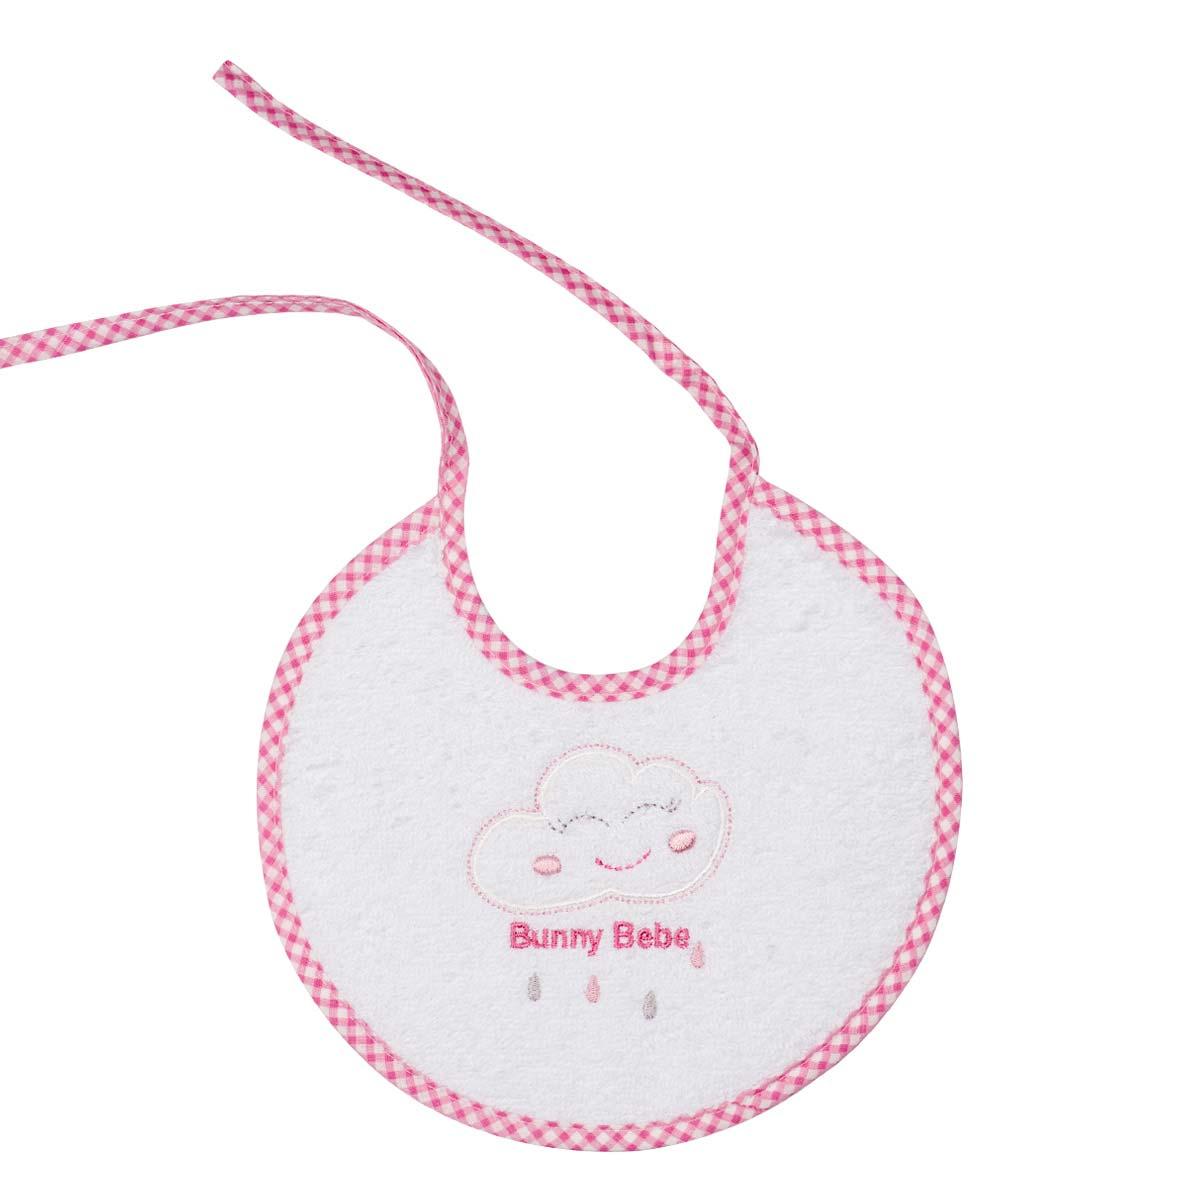 Bunny bebe σαλιάρα πετσετέ με ρέλι σύννεφο ροζ